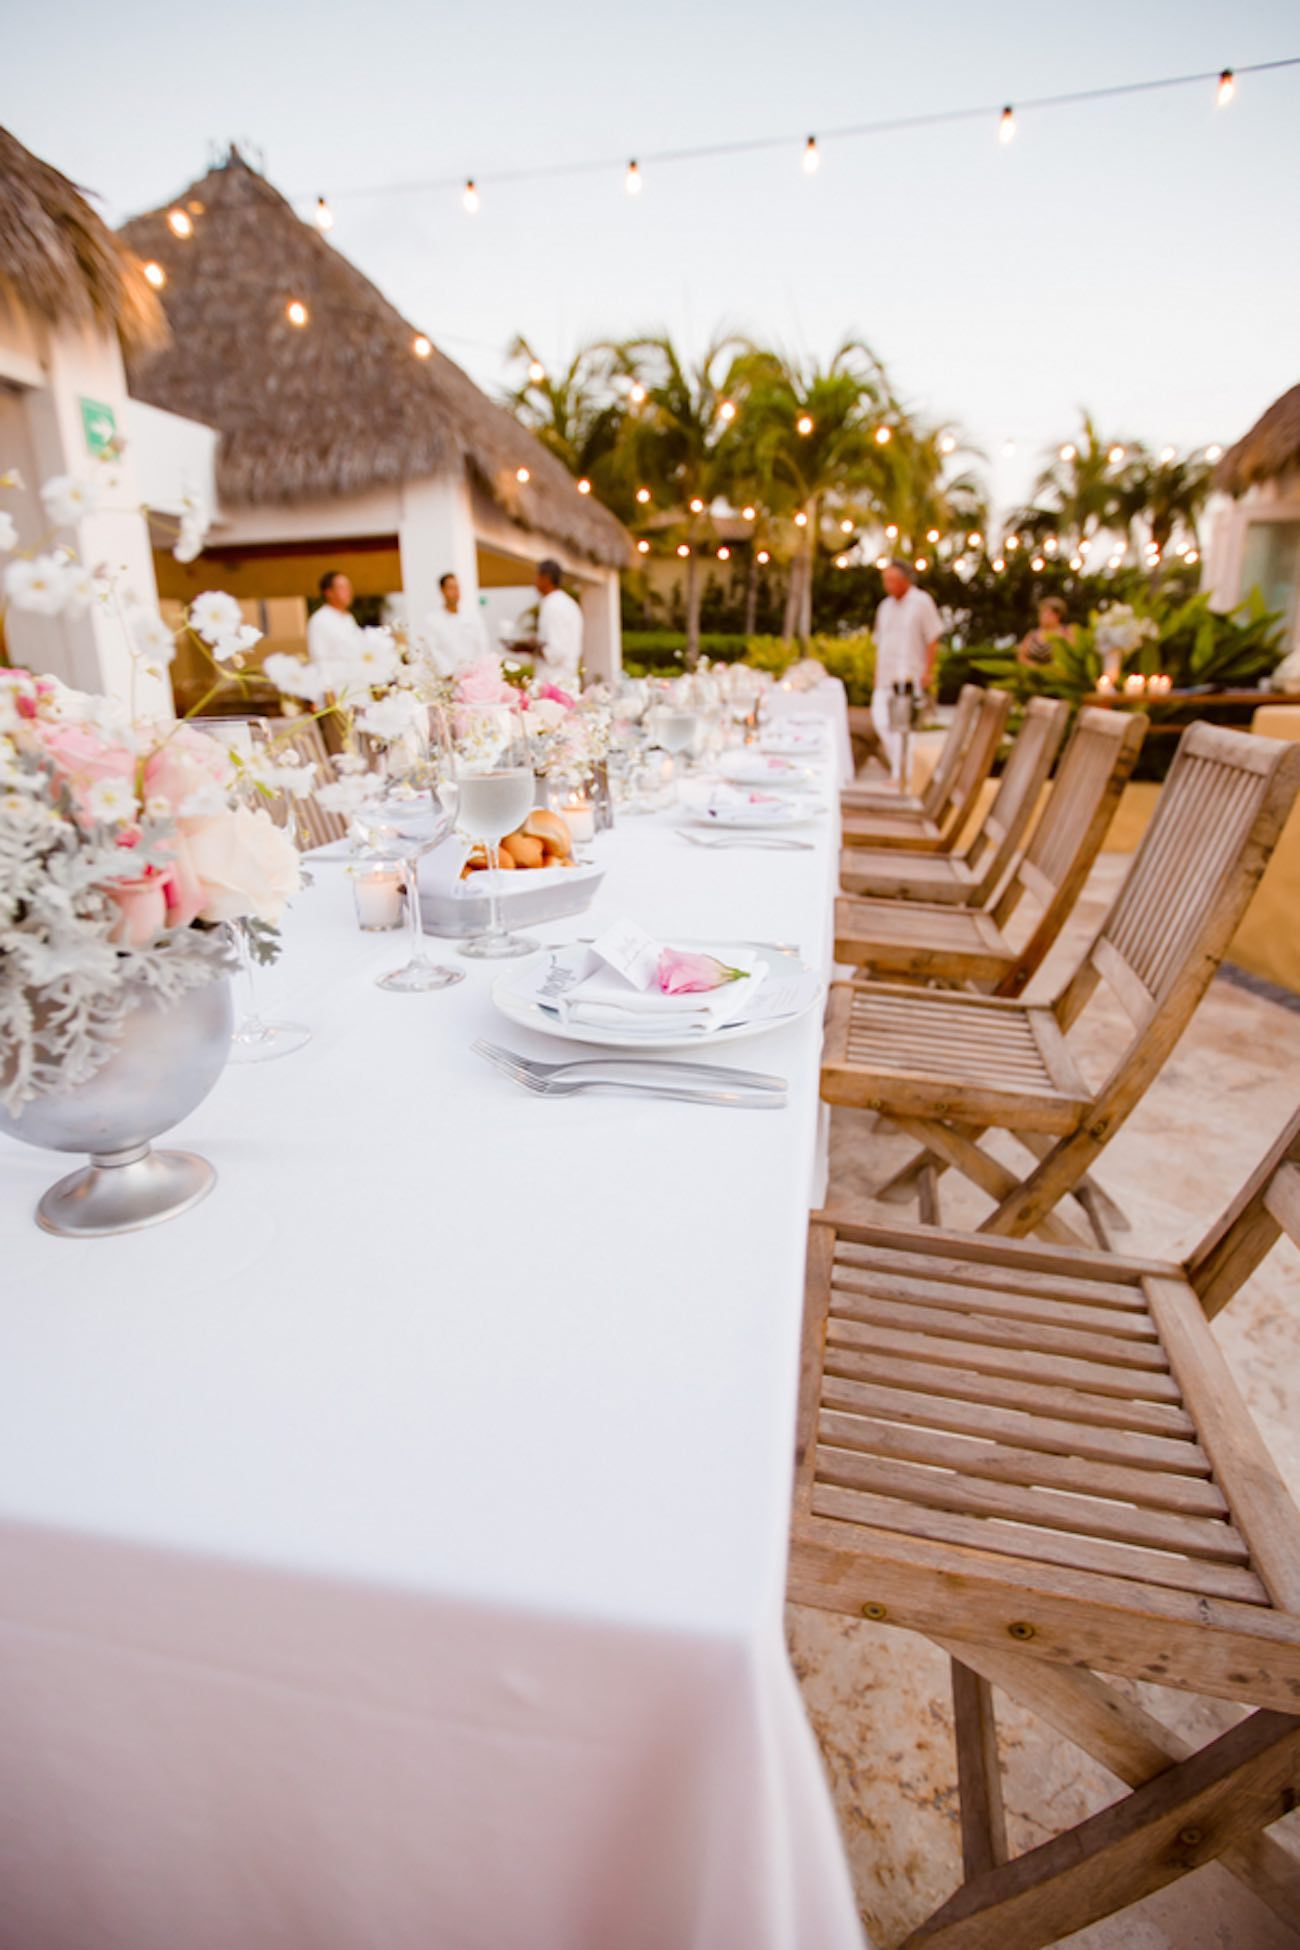 25 Beach Themed Wedding Projects & DIY Inspiration | Beach weddings ...